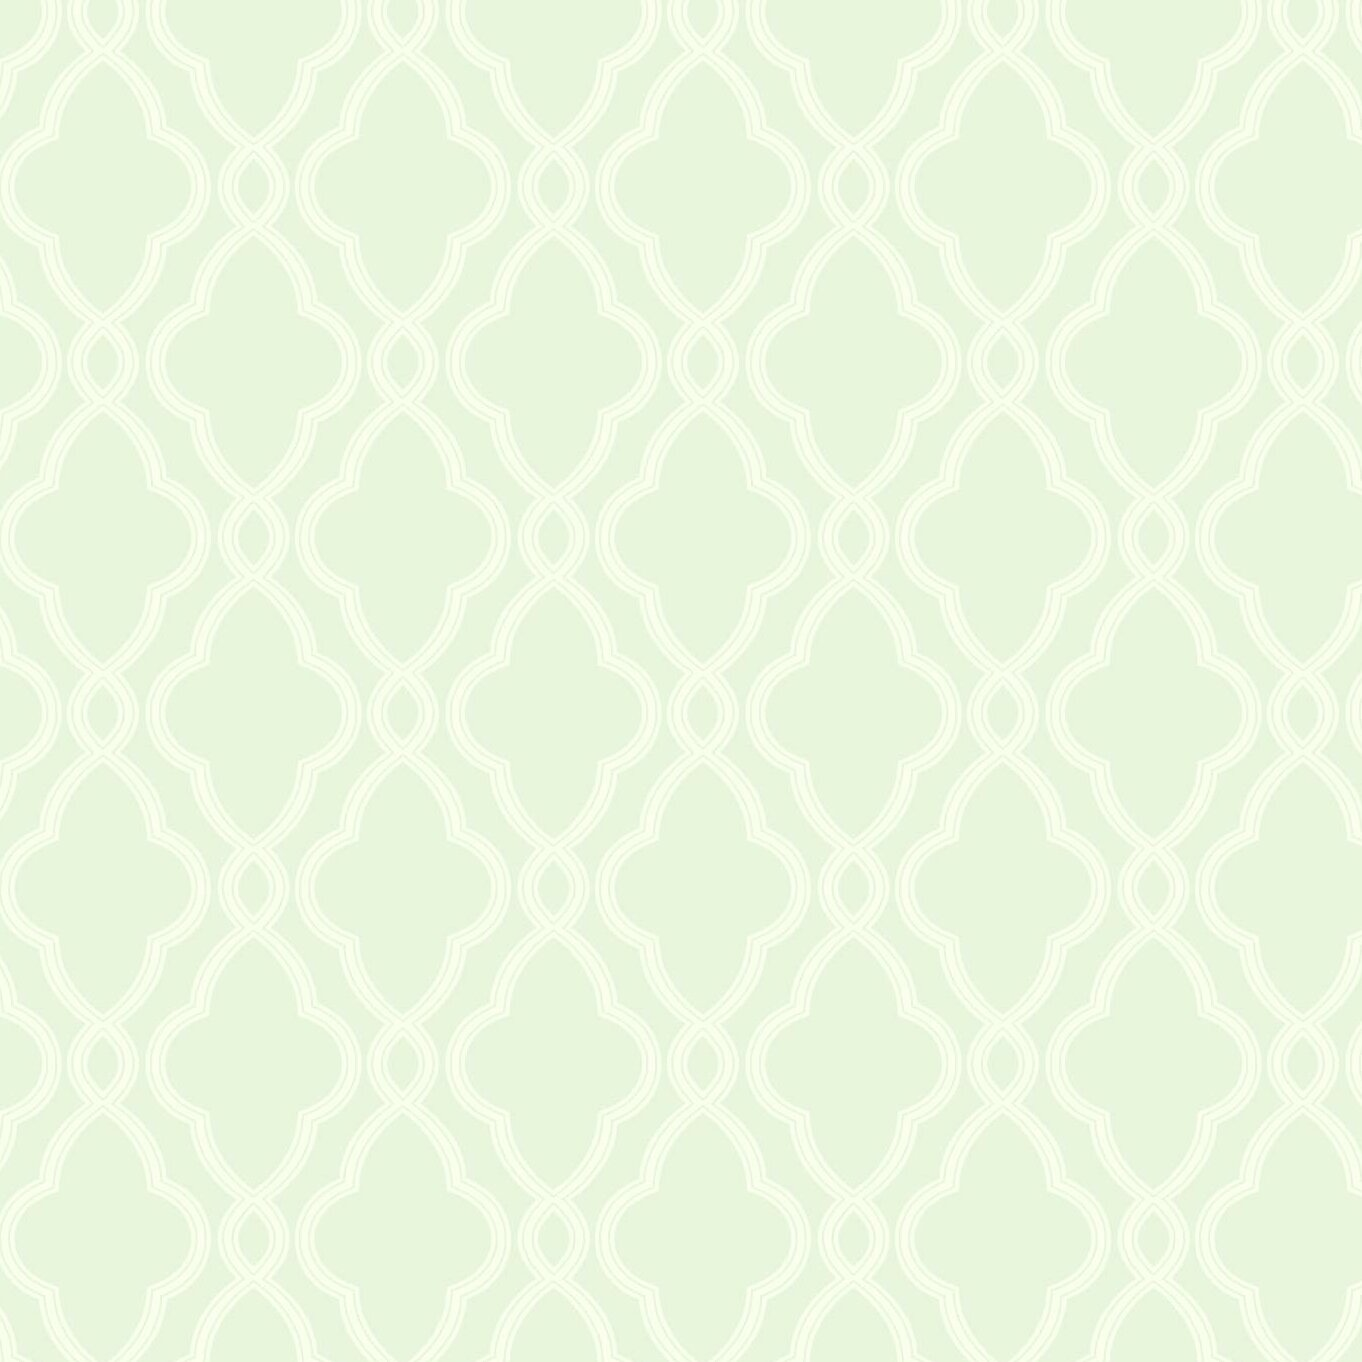 Waverly Hampton Trellis 27 X 27 Wallpaper Roll